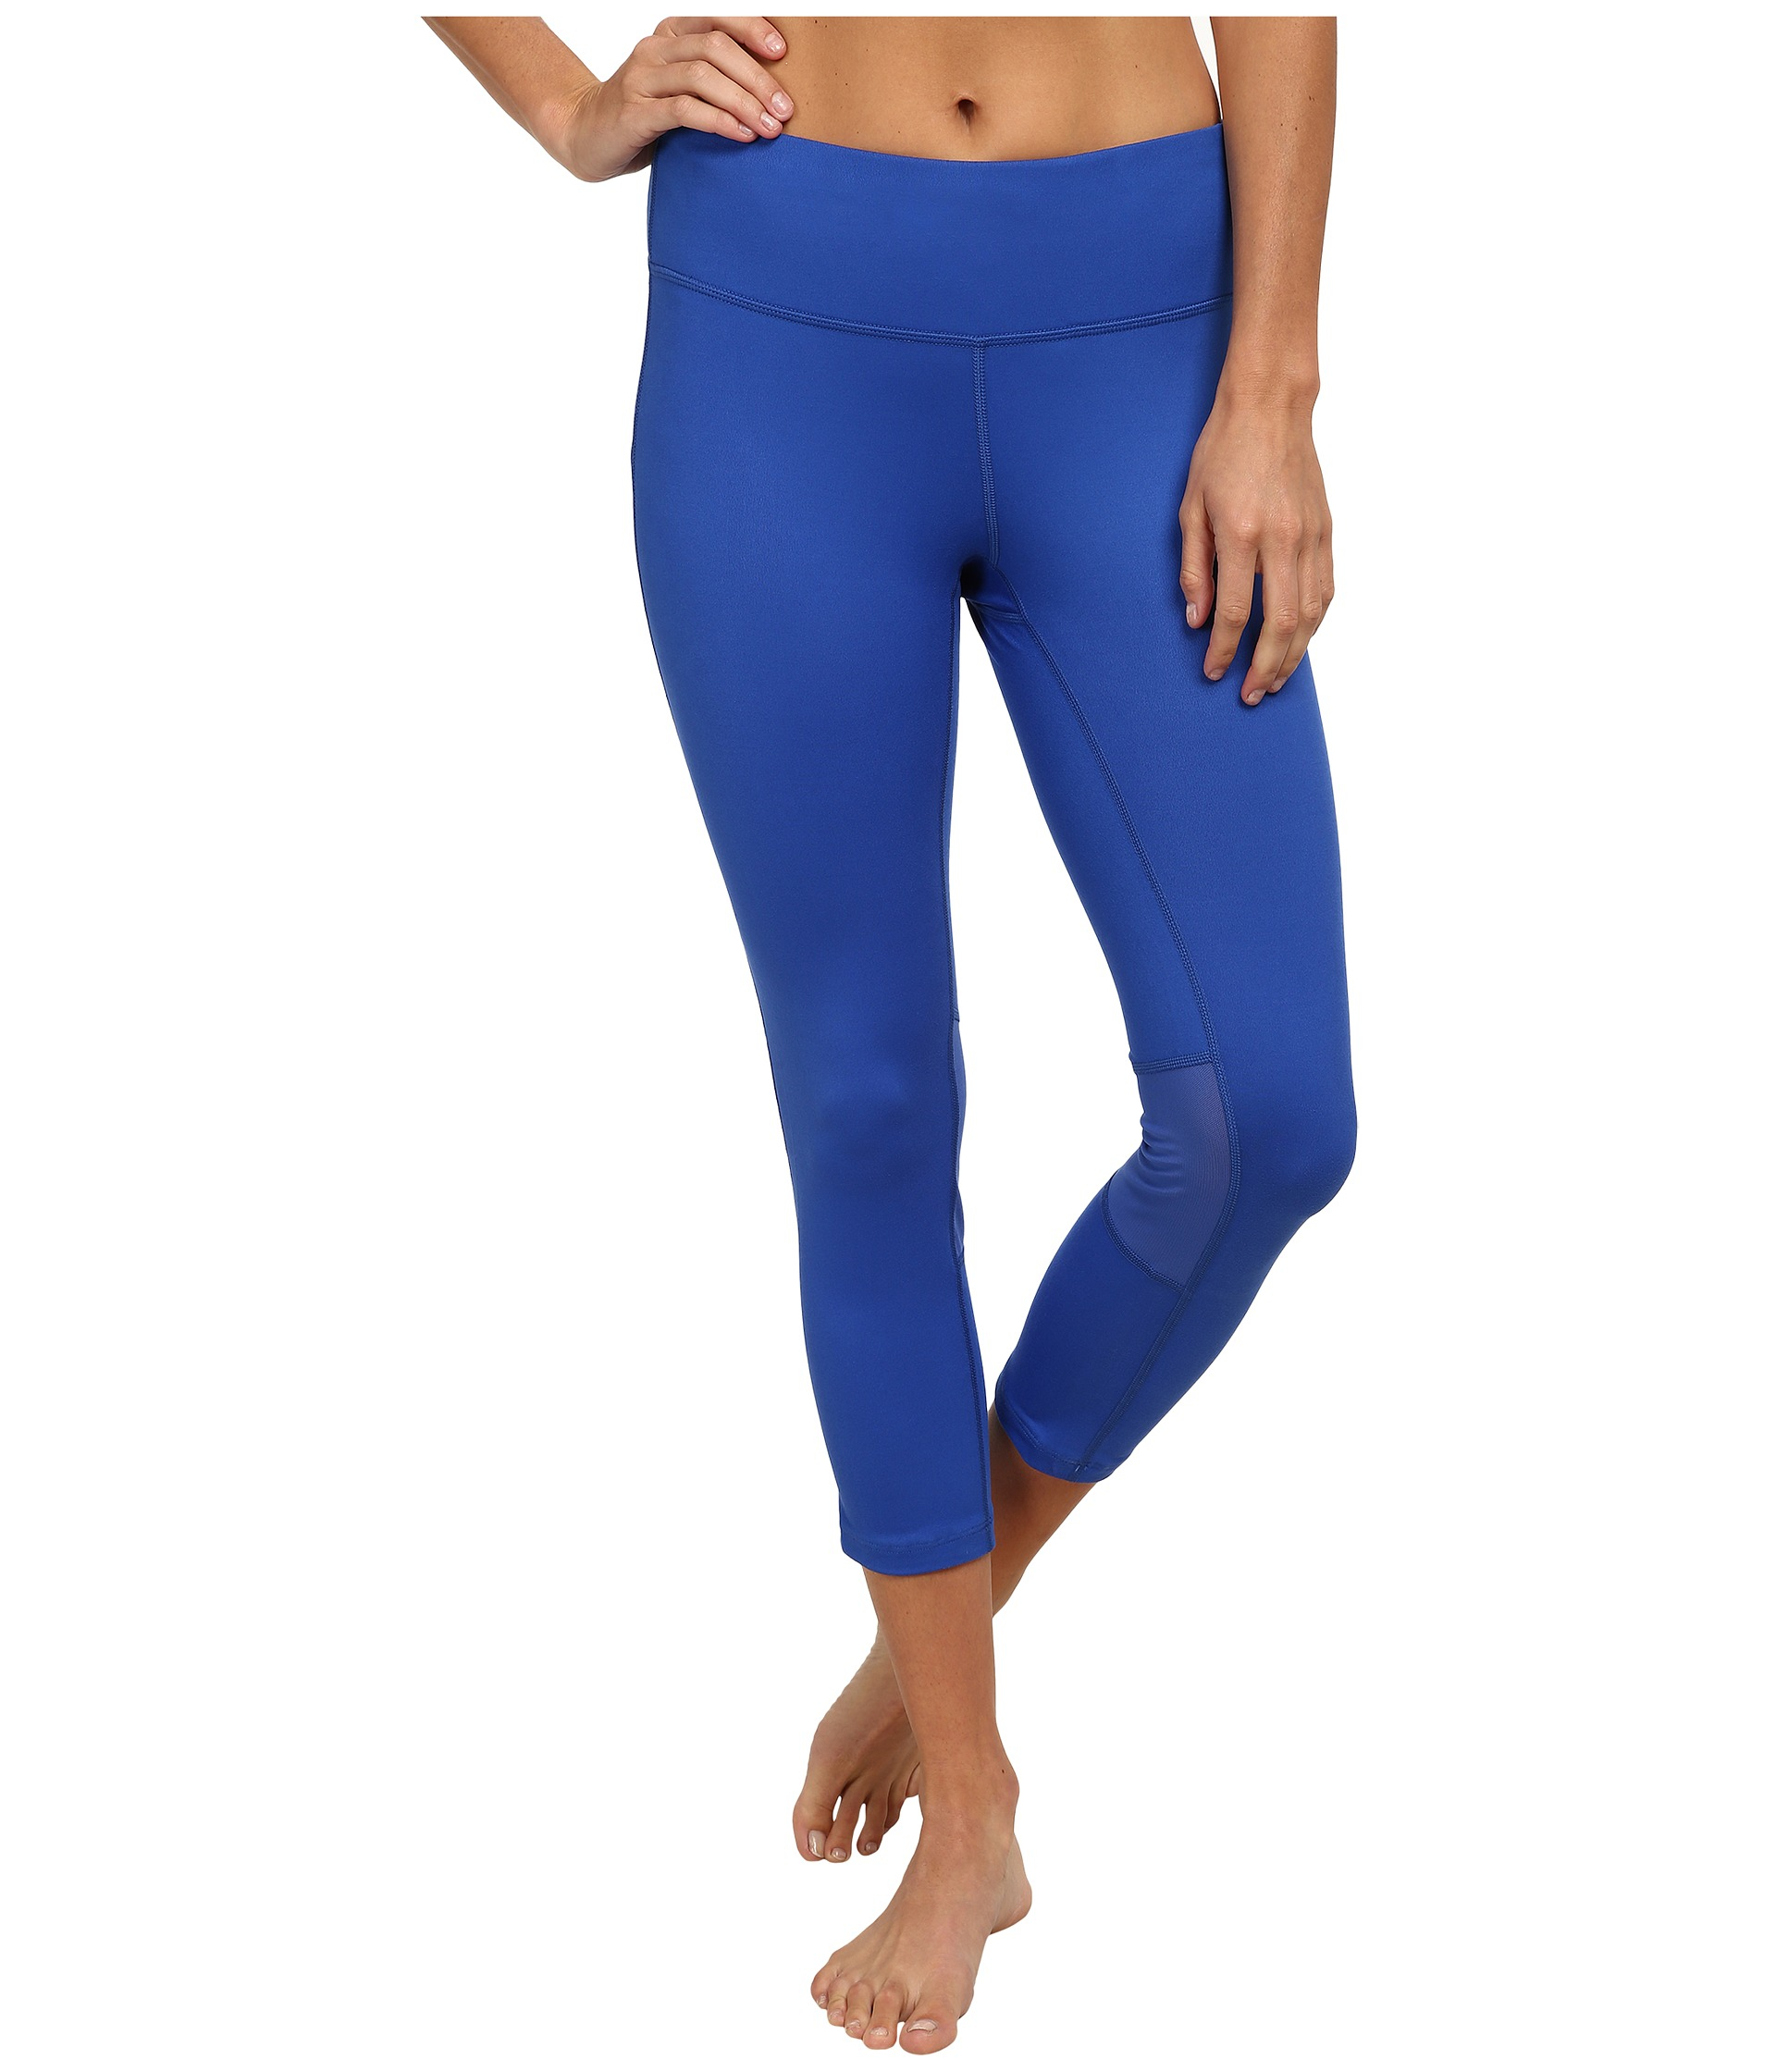 2ec29c4f693dd Nike Dri-fit™ Epic Run Crop in Blue - Lyst